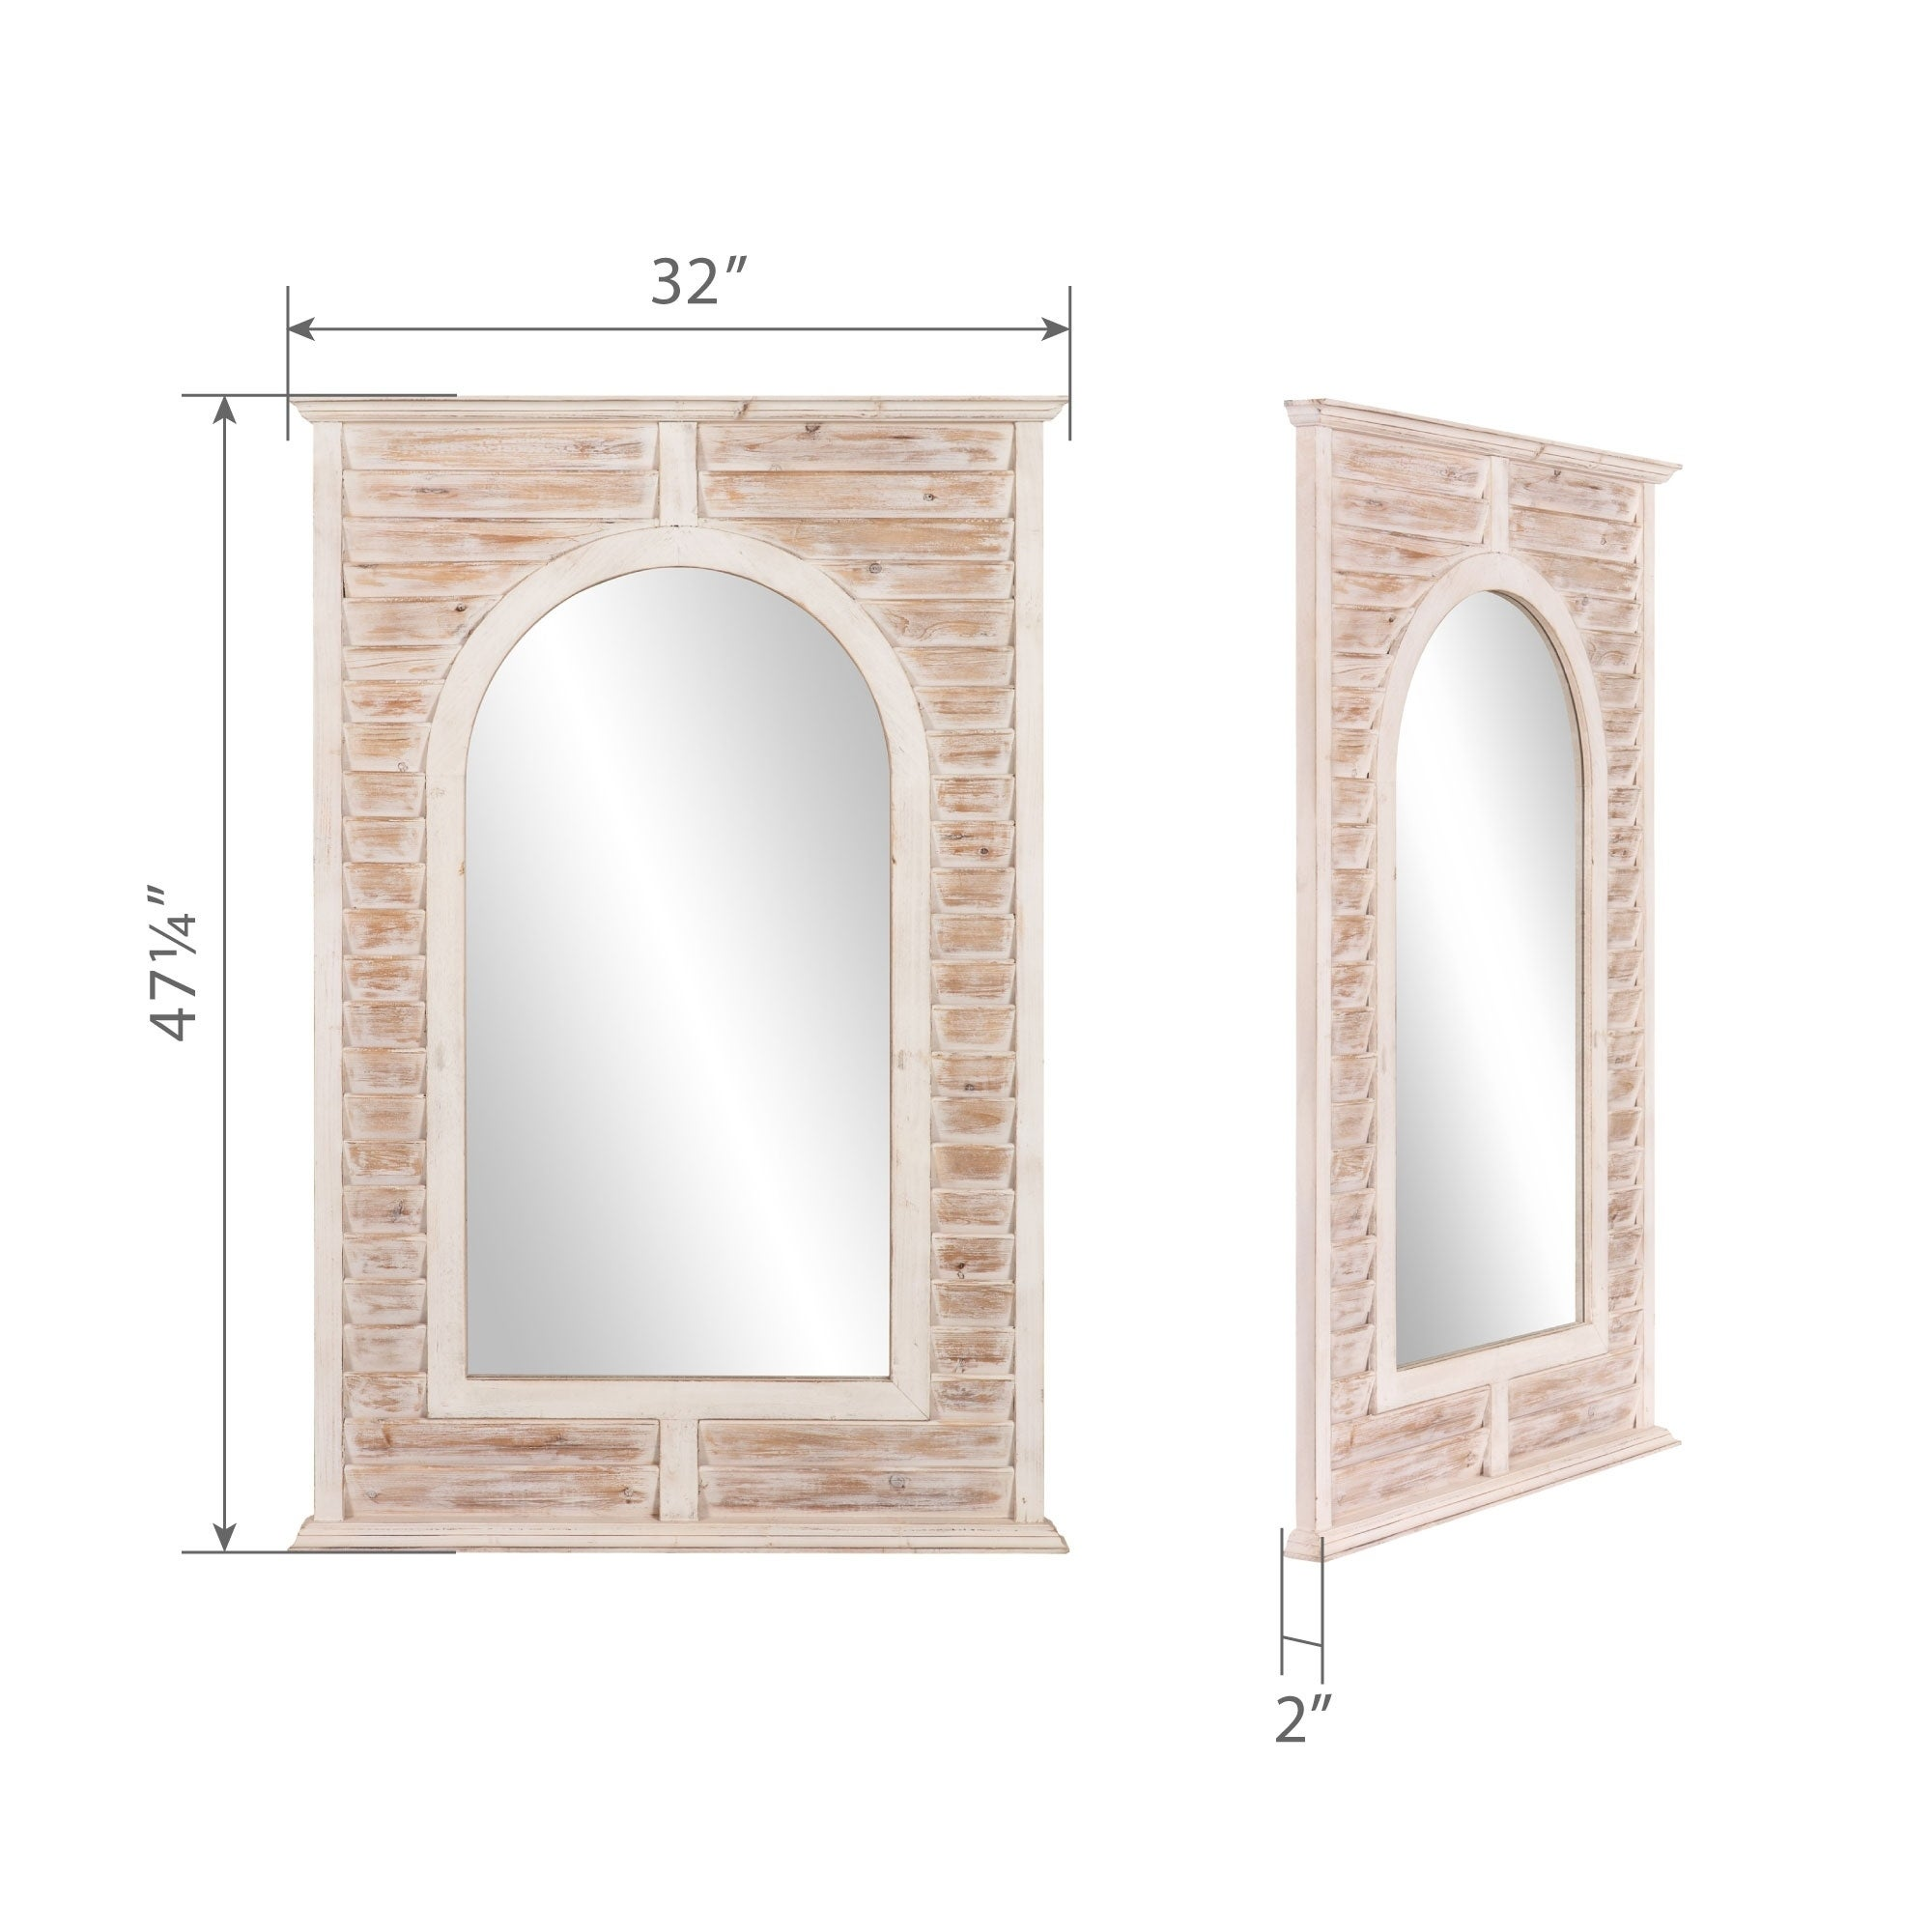 Patton Wall Decor 32x47 Antique Window Shutter Arch Wall Mirror